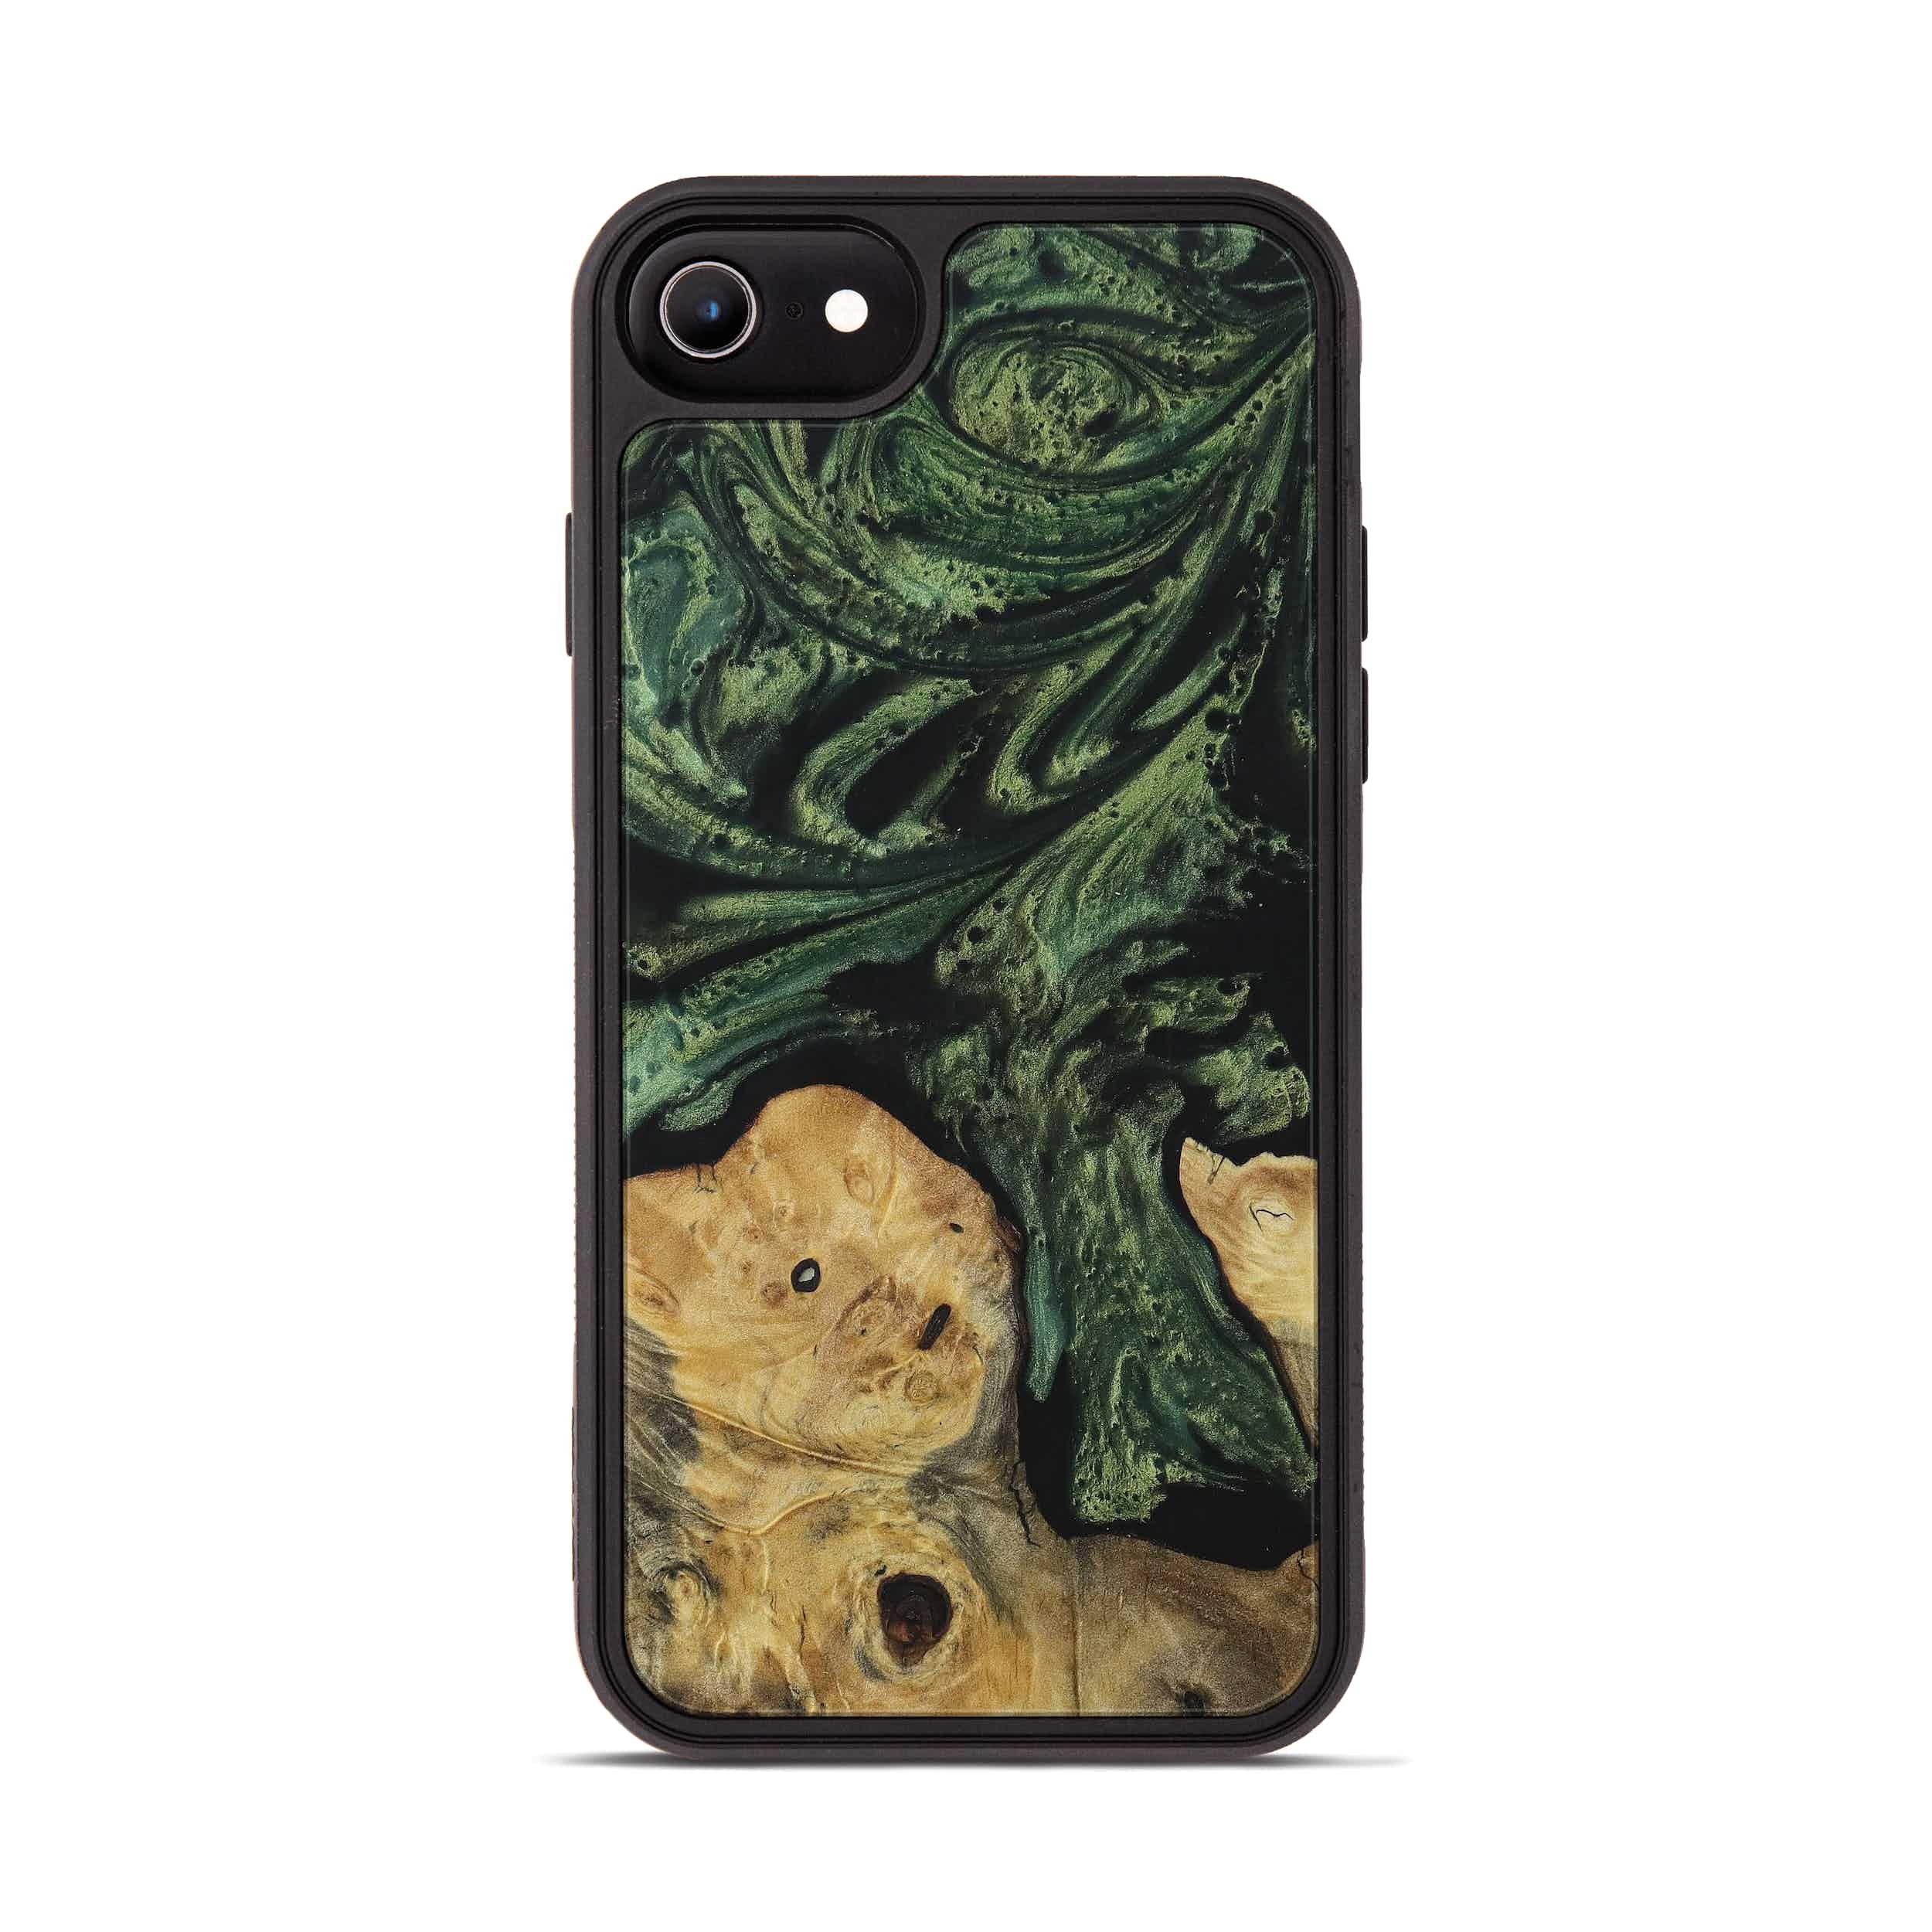 iPhone 6s Wood+Resin Phone Case - Wieslawa (Dark Green, 395071)